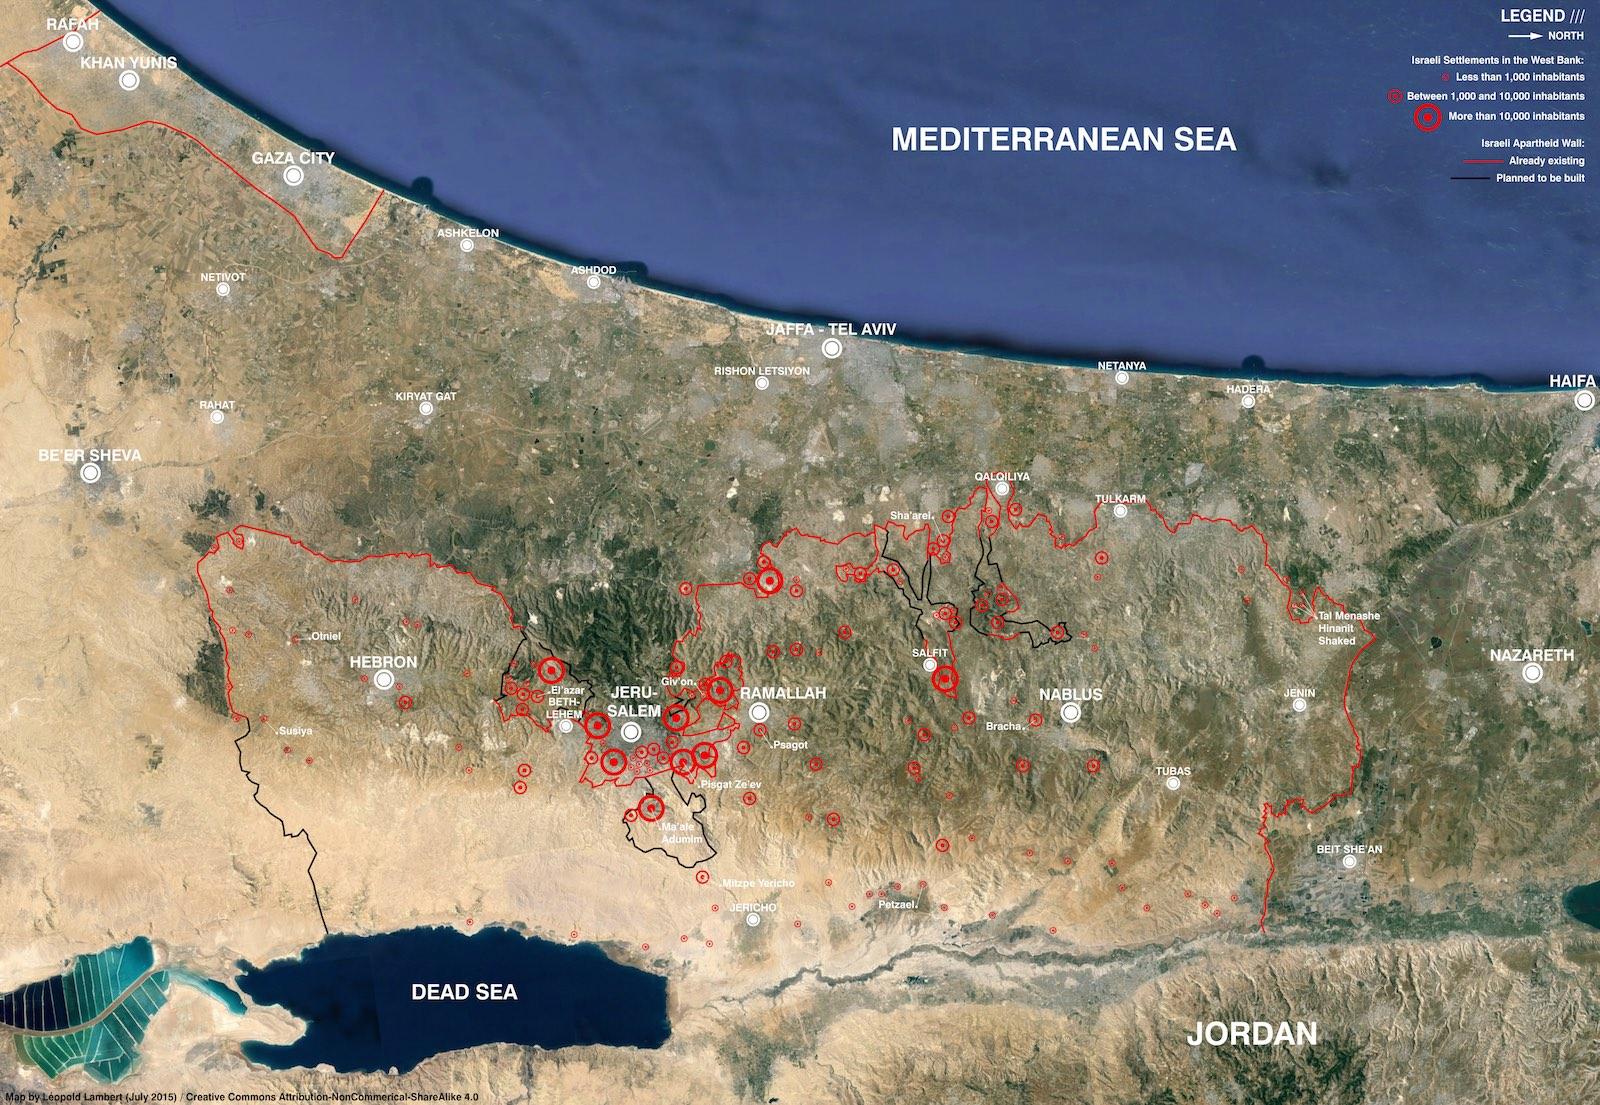 Beer Sheva Israel Map%0A Israeli settlements and separation barrier in Palestine  u    nbsp July       u    nbsp  Map by